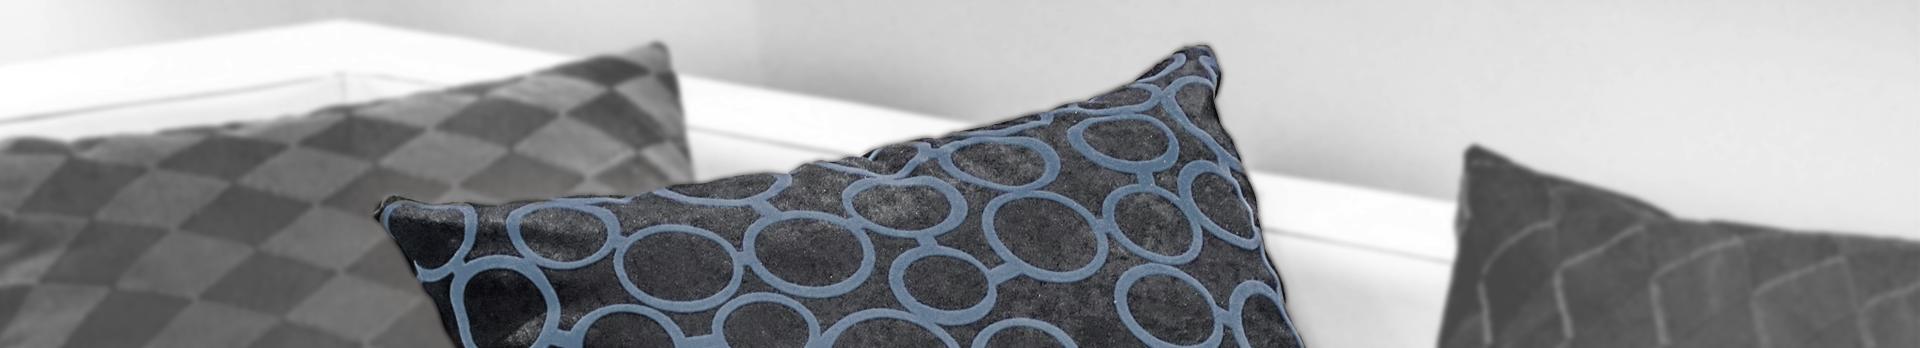 Textil Hogar | Alfombras,  Cojines, Mantas | Mobelfy ®